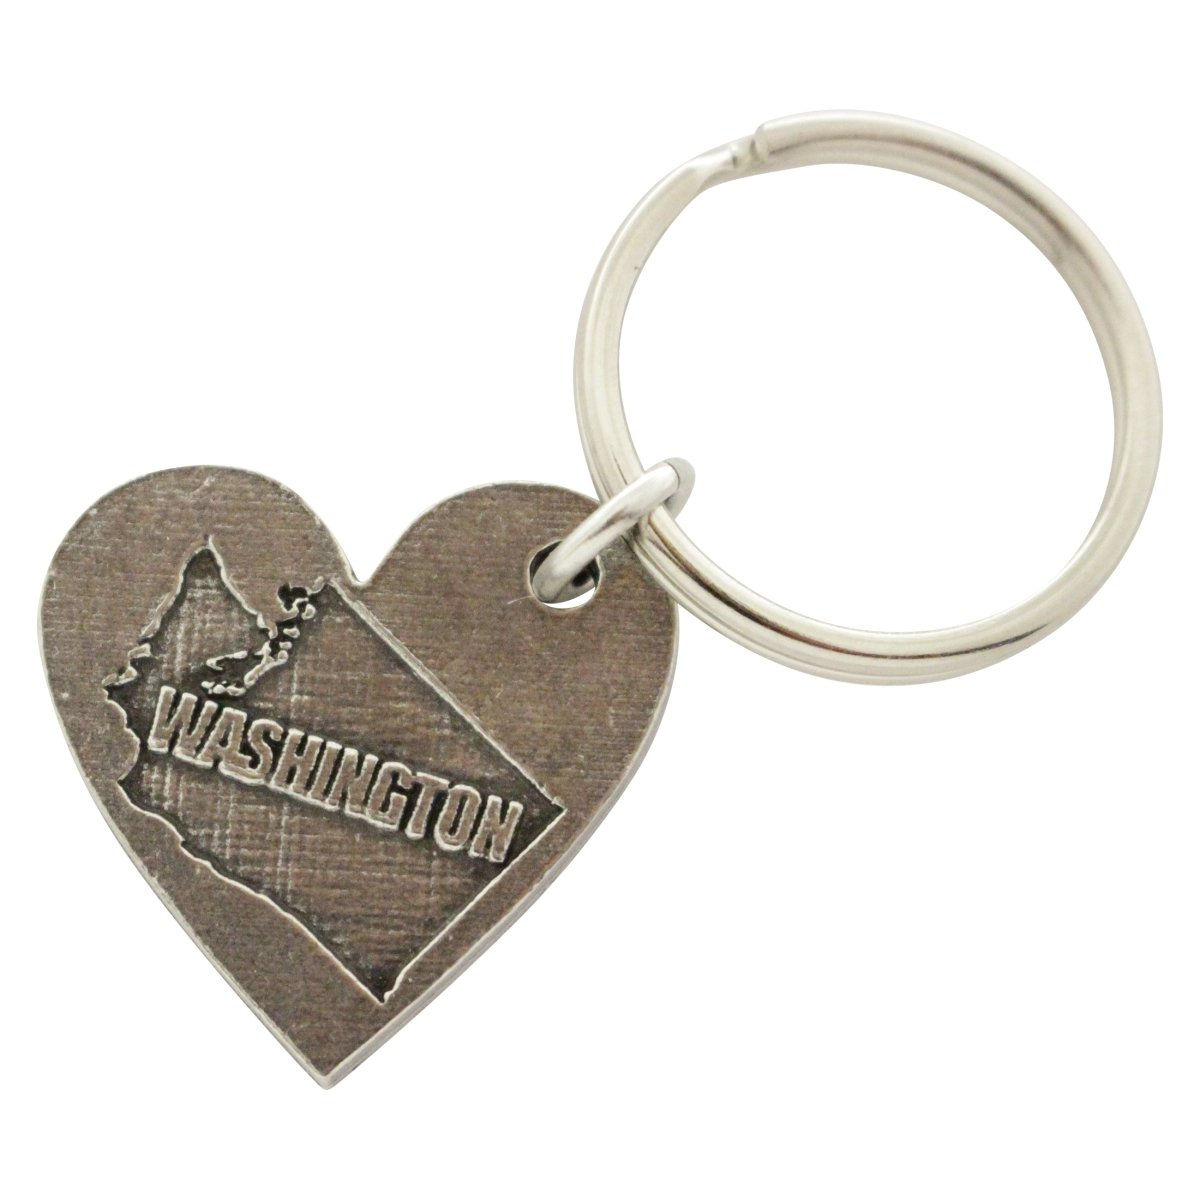 Creative Pewter Designs, Pewter Washington Heart Shape Key Chain, Antiqued Finish, A1016KC